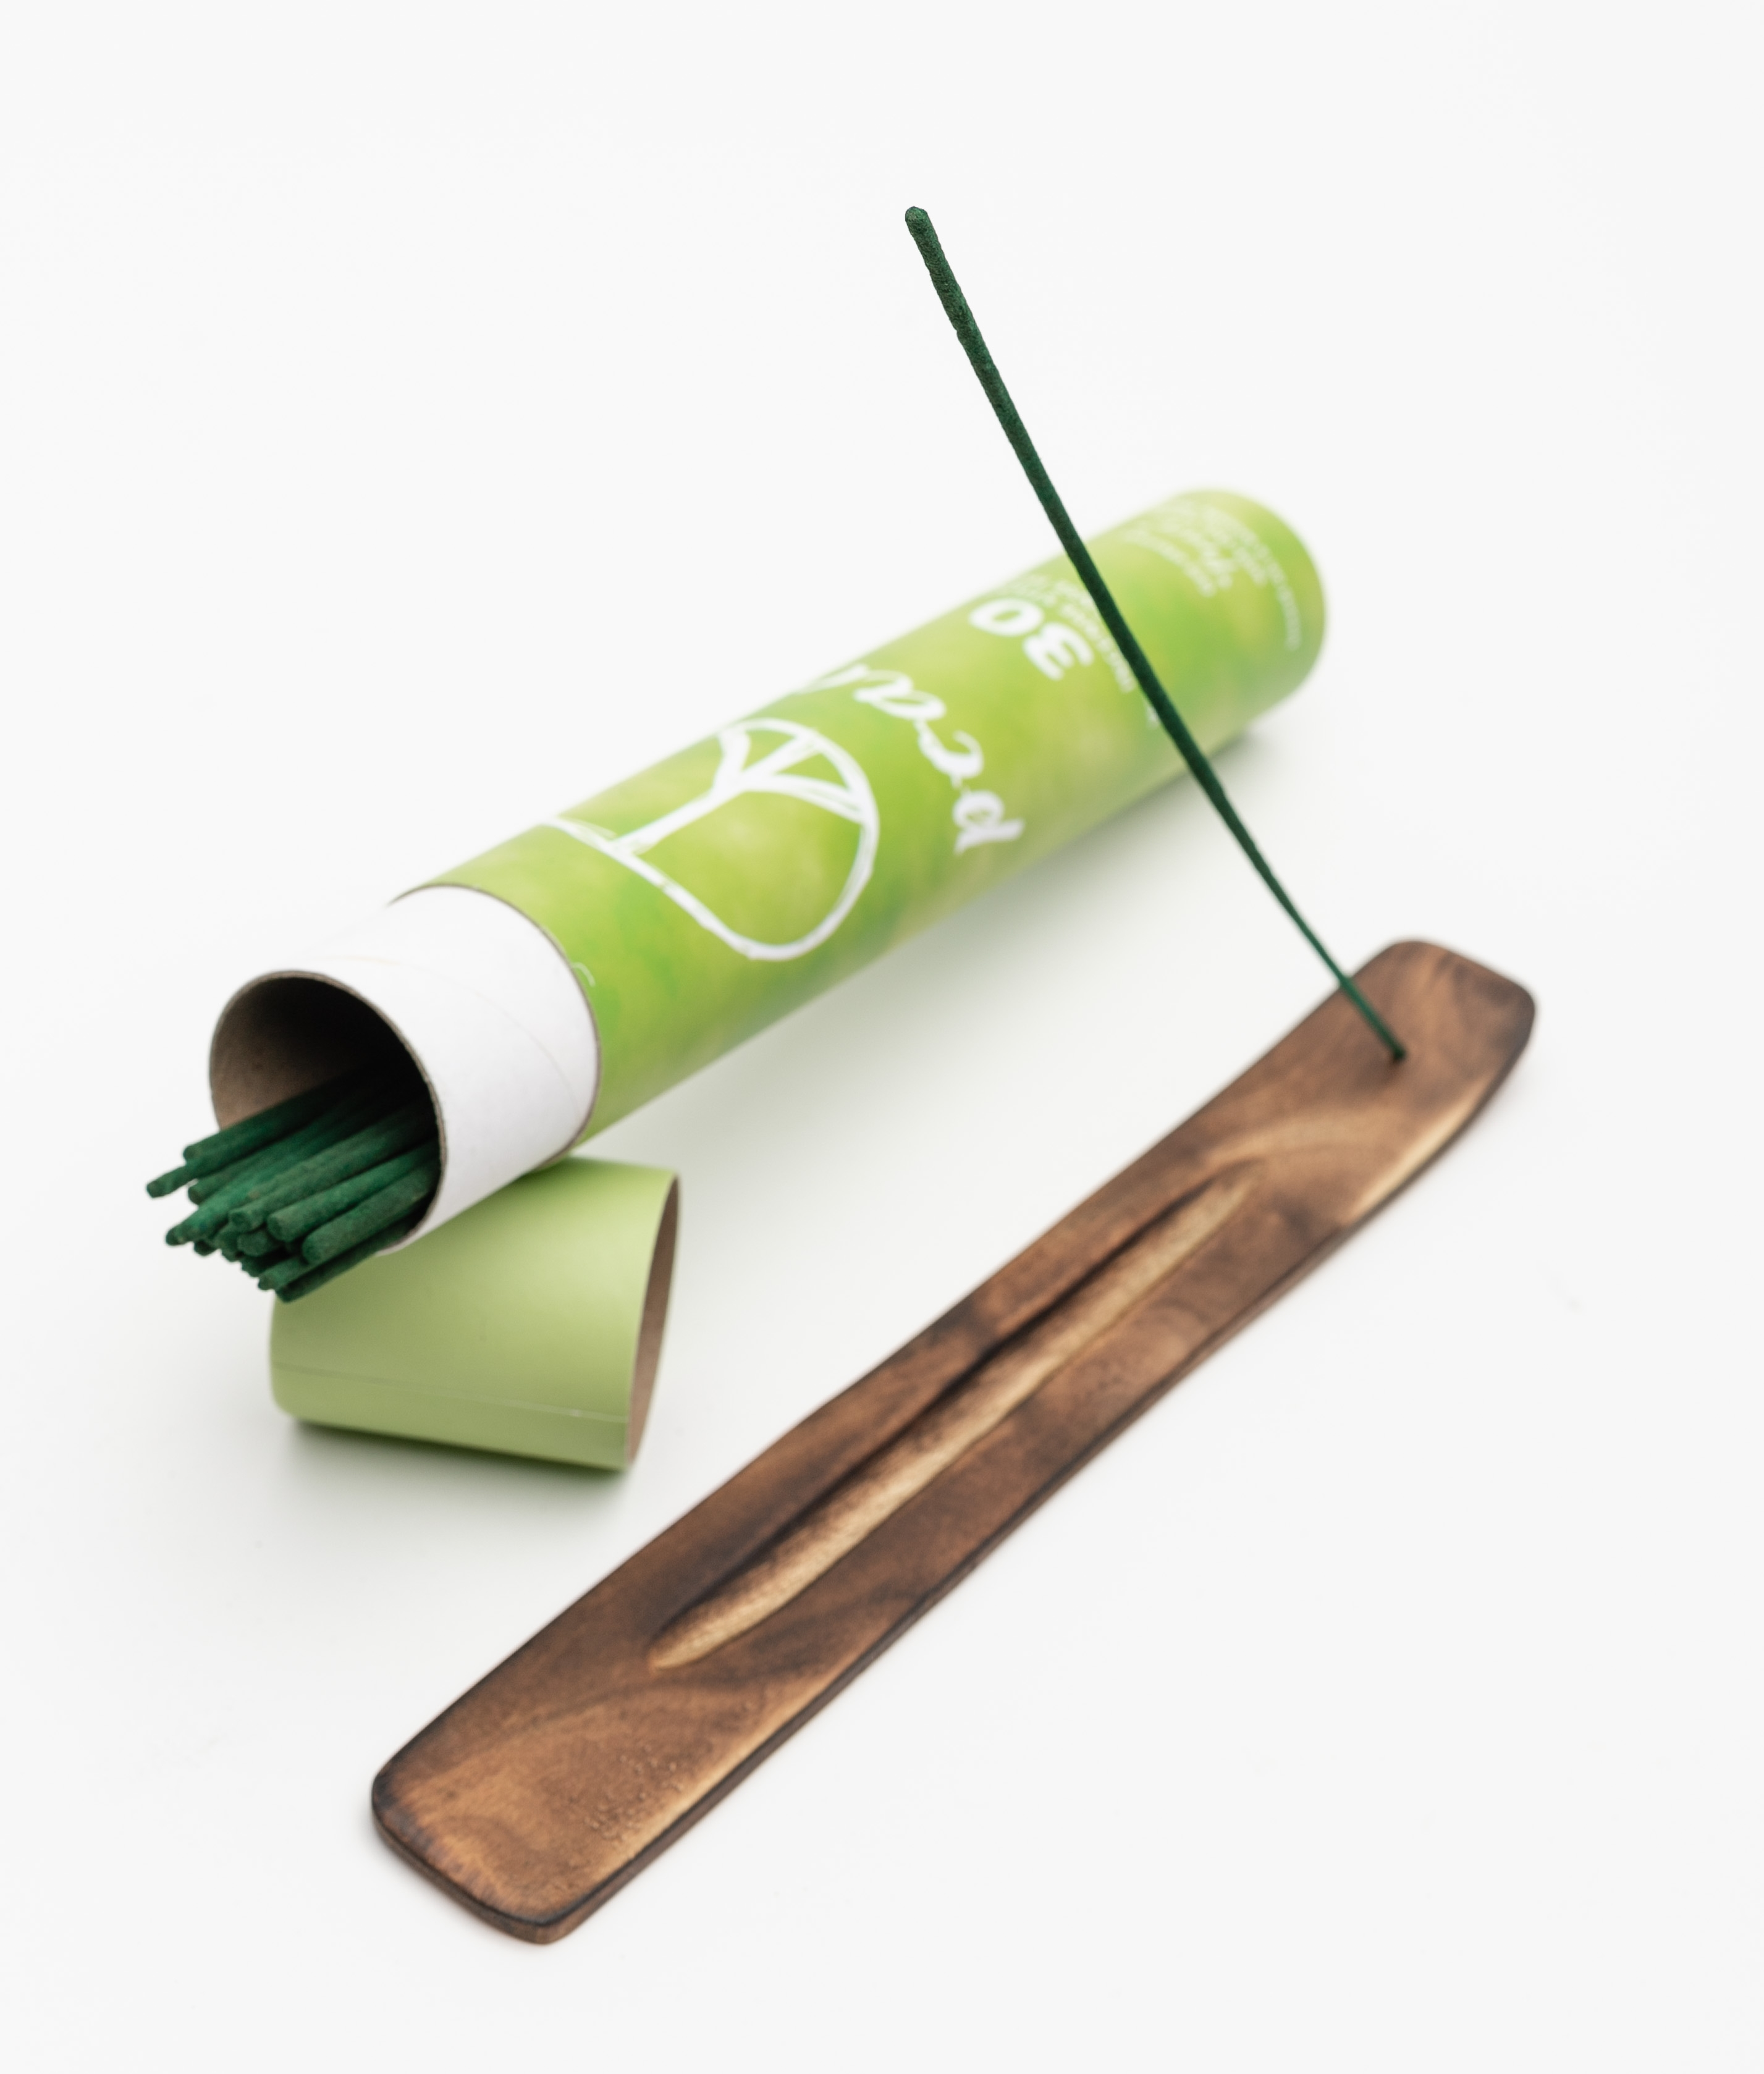 STICK INCIENSO XONBER - GREEN